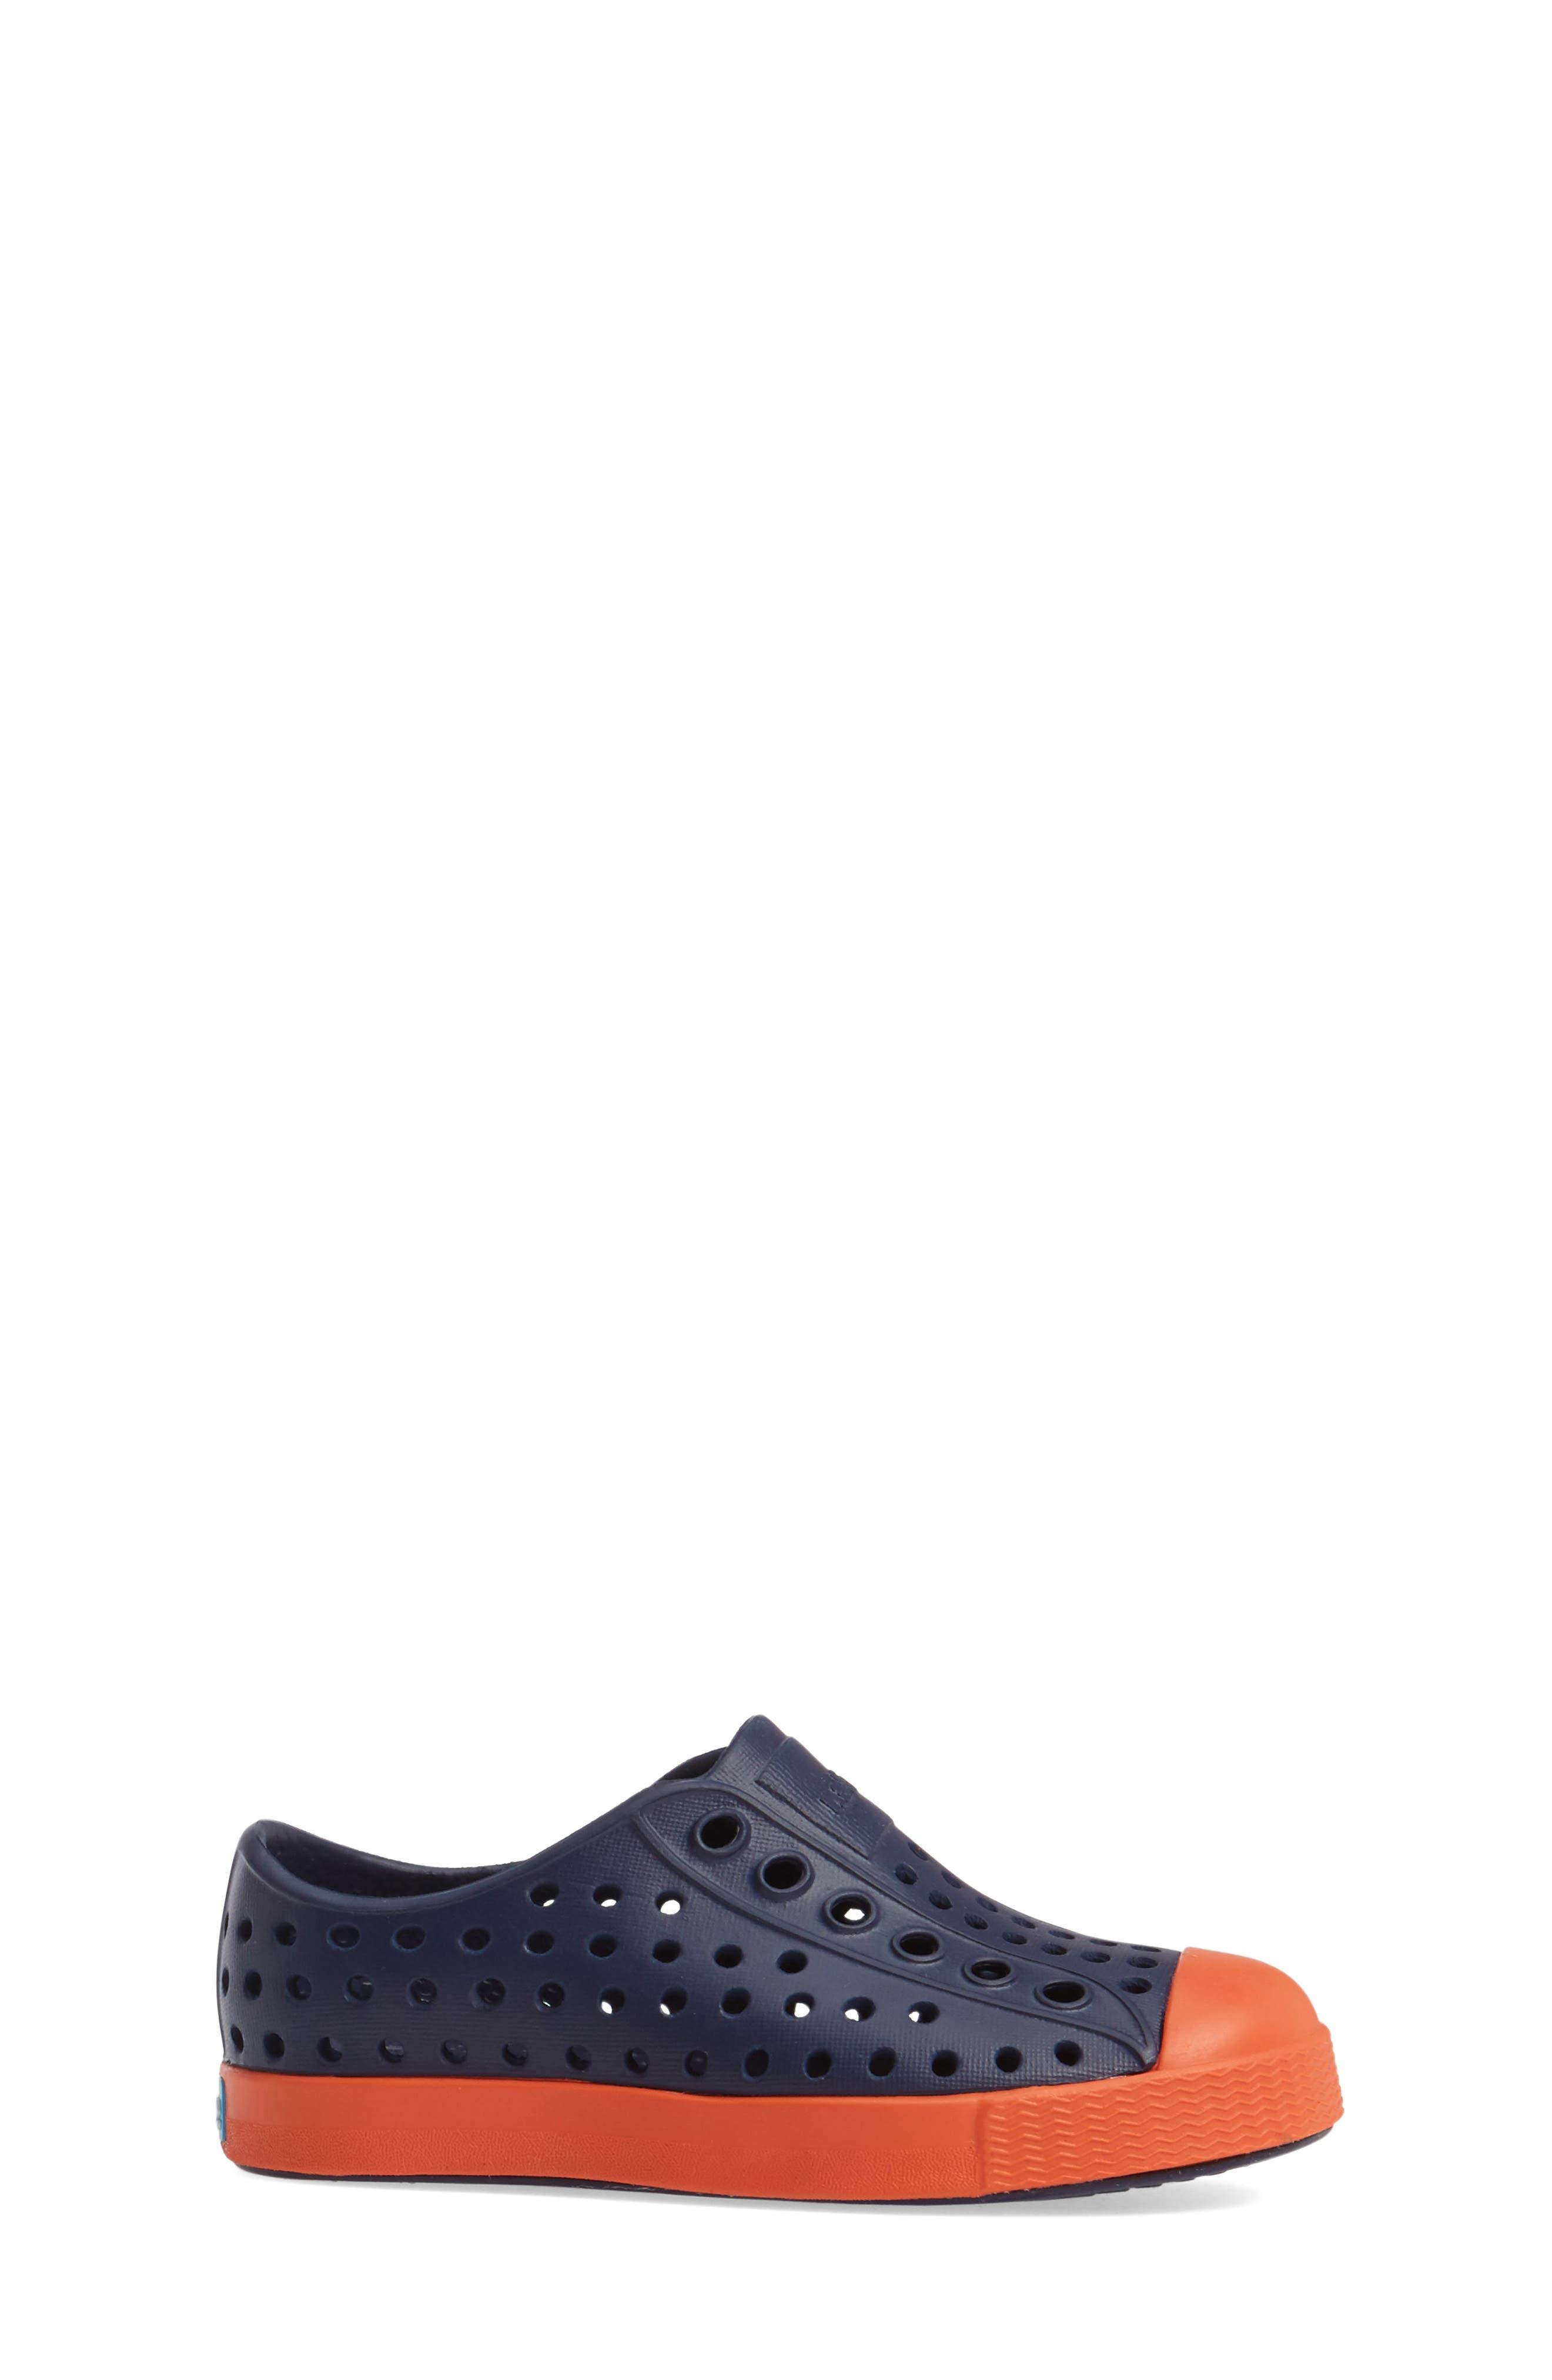 'Jefferson' Water Friendly Slip-On Sneaker,                             Alternate thumbnail 152, color,